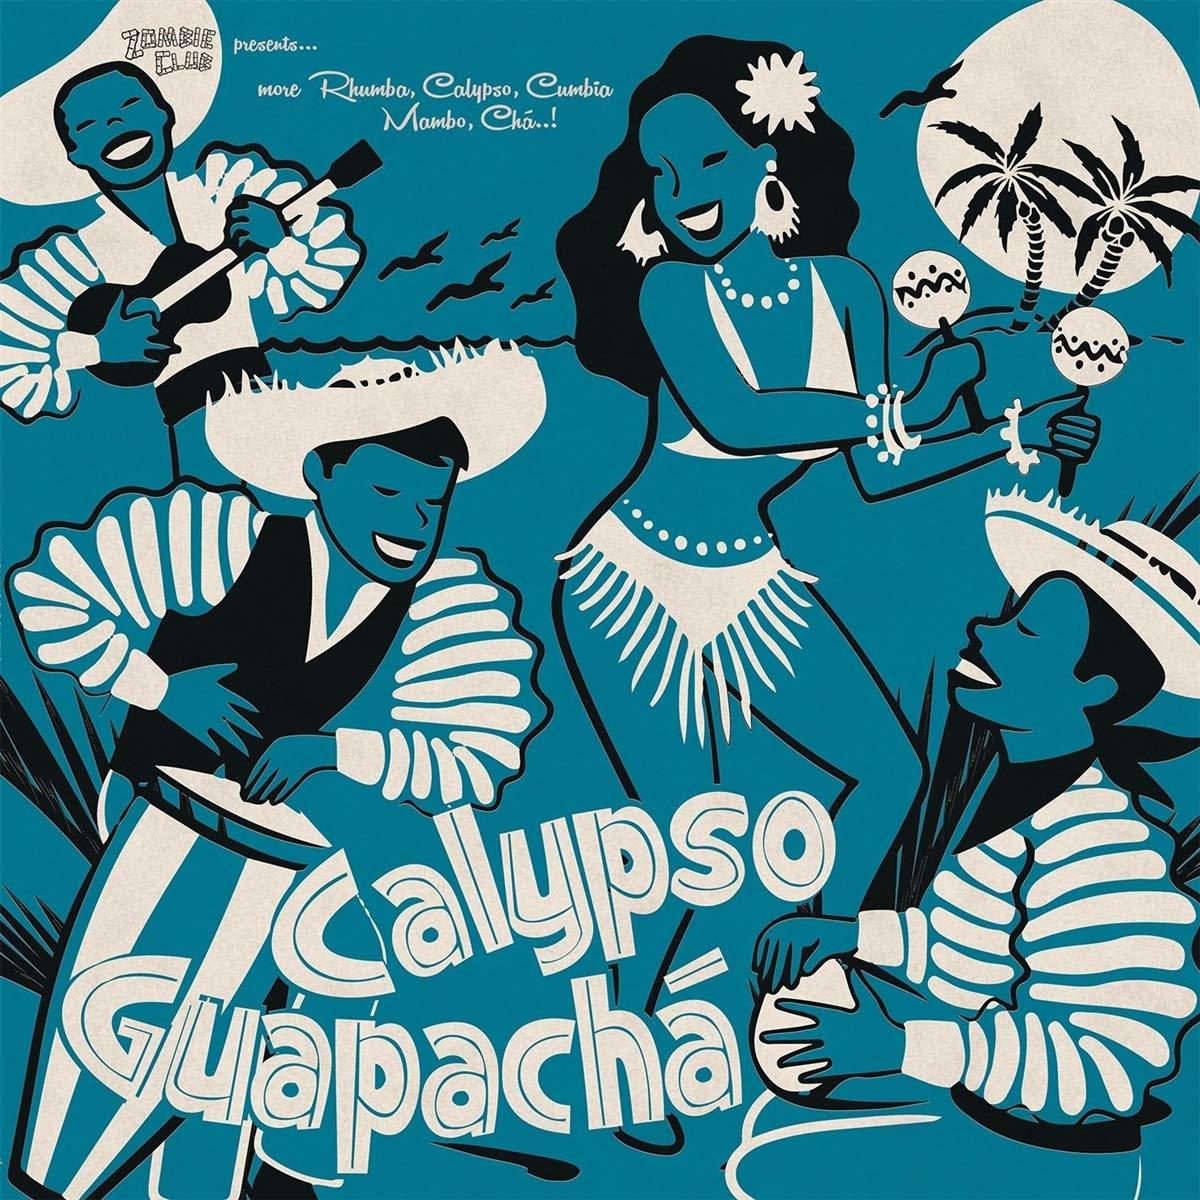 Max 67% OFF Calypso Sales Guapacha